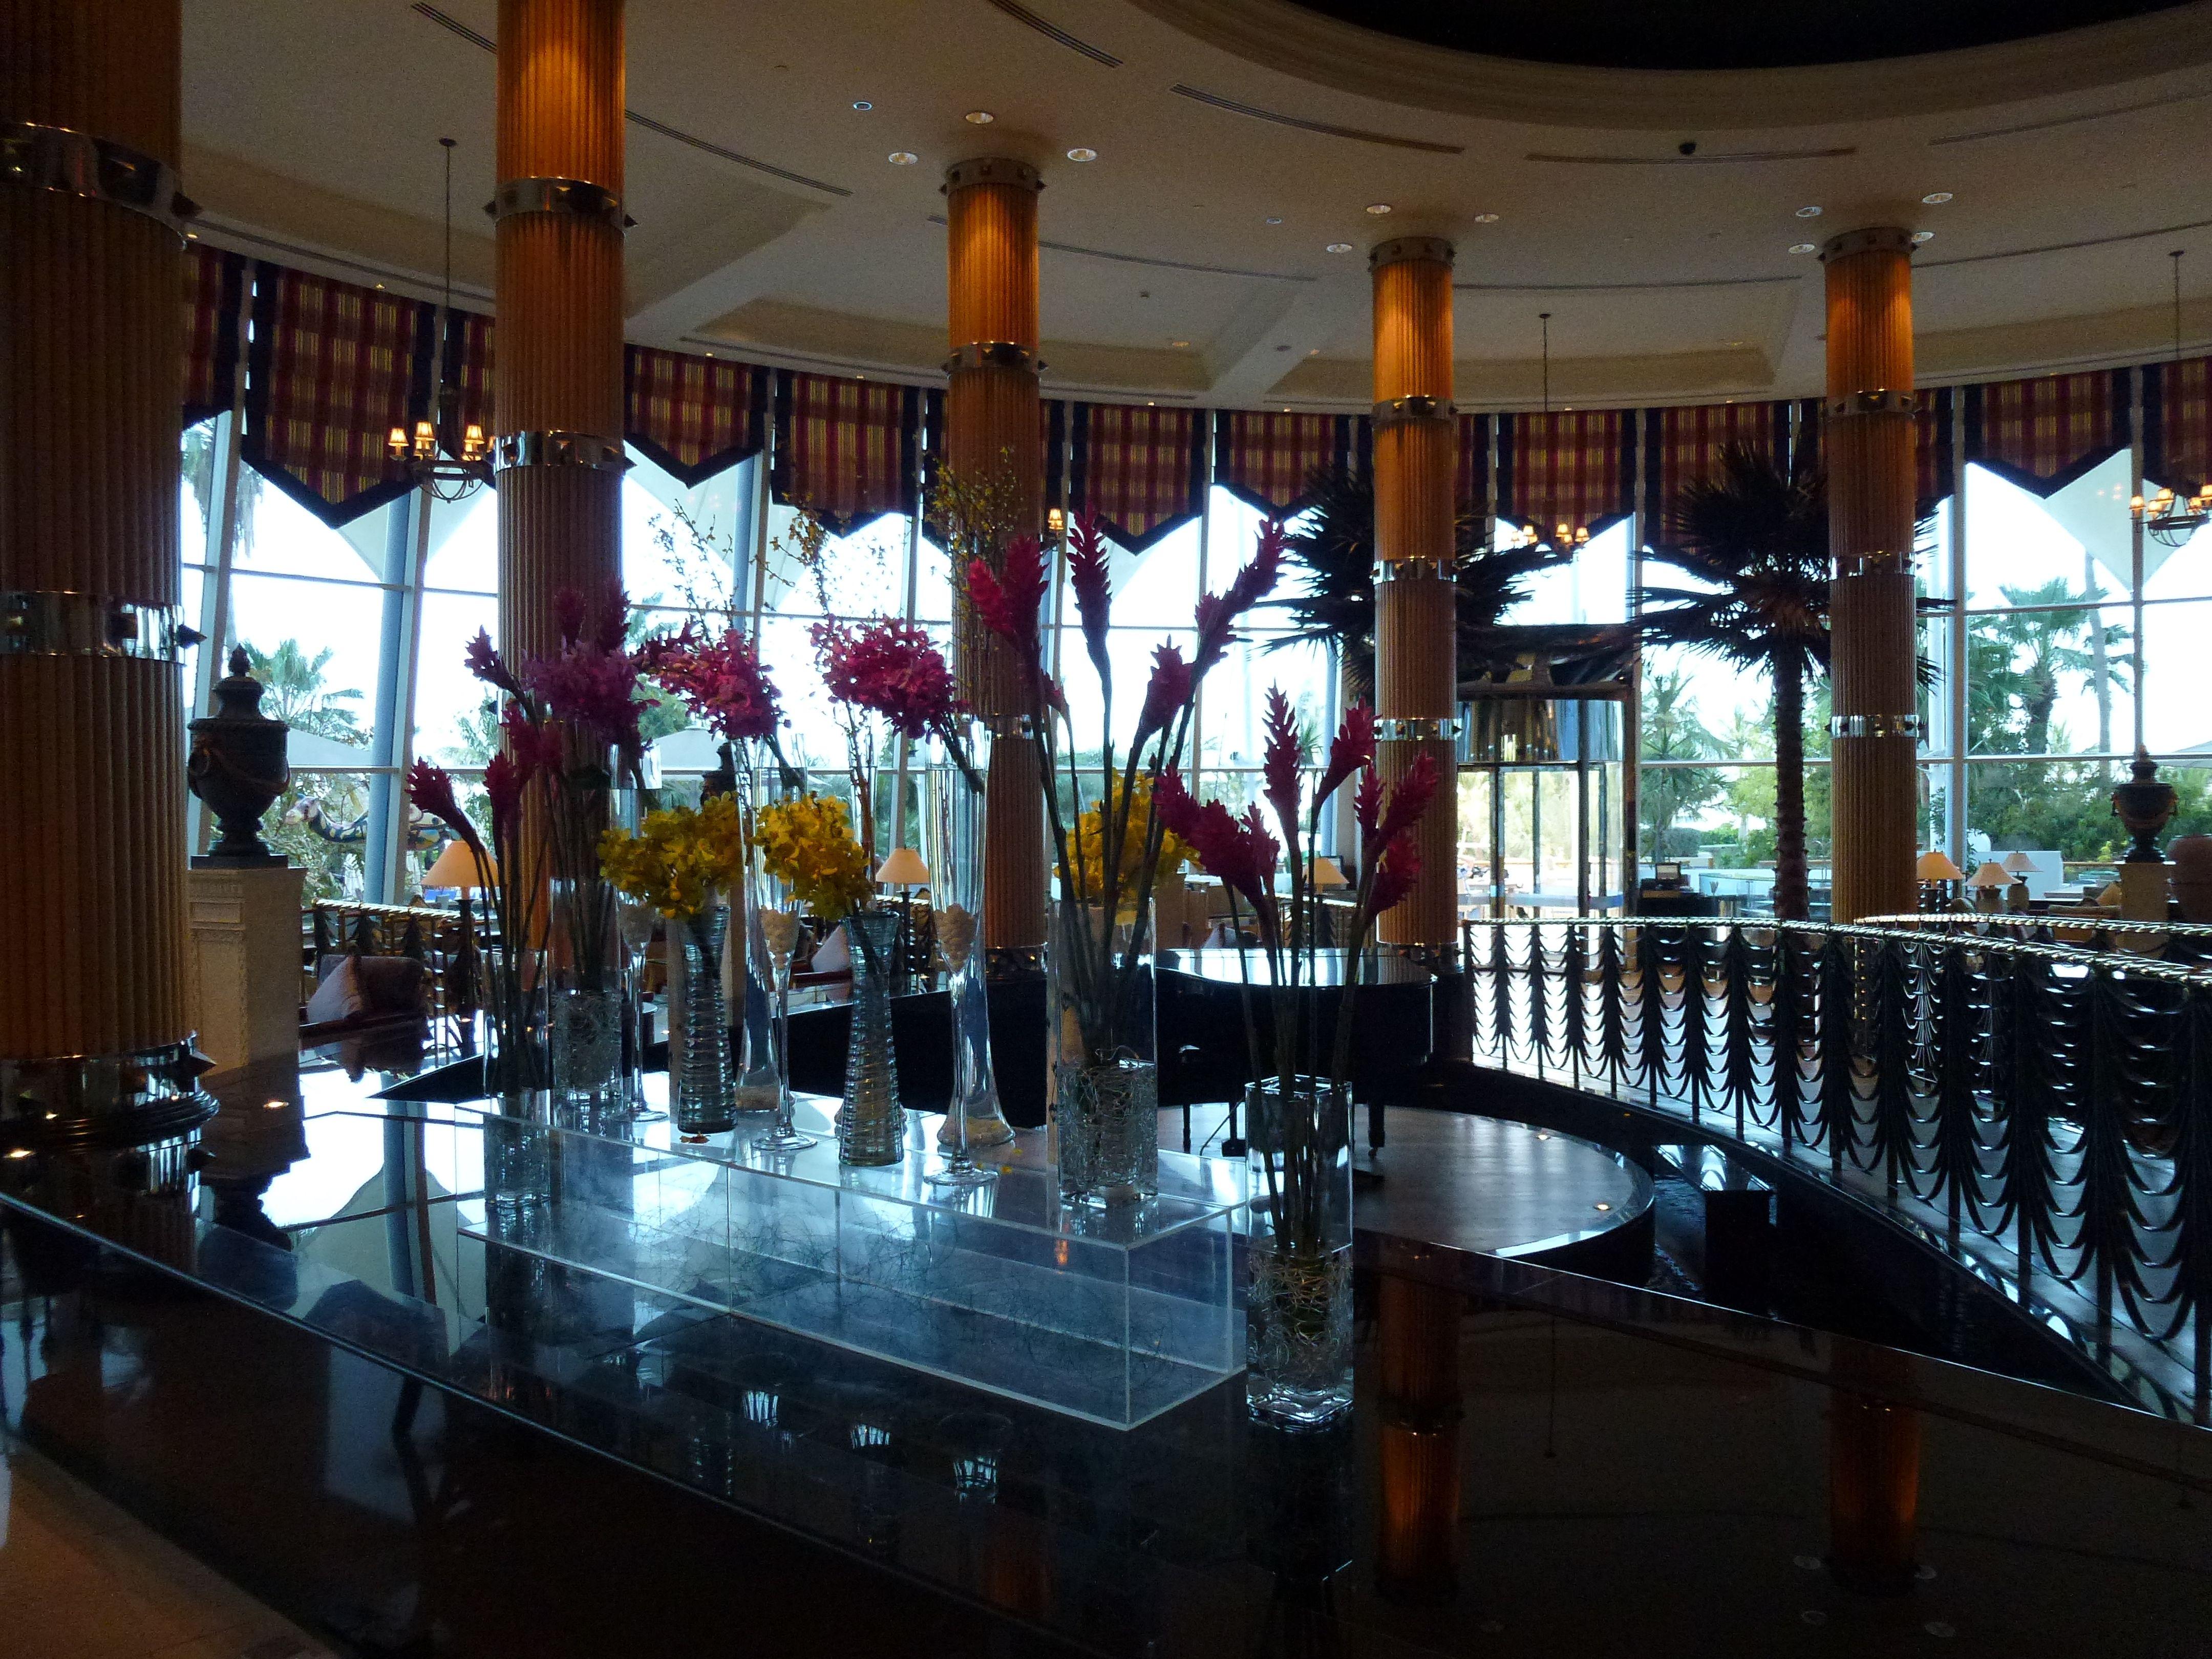 Jumeriah Beach Hotel Lobby Beach hotel lobby, Hotel